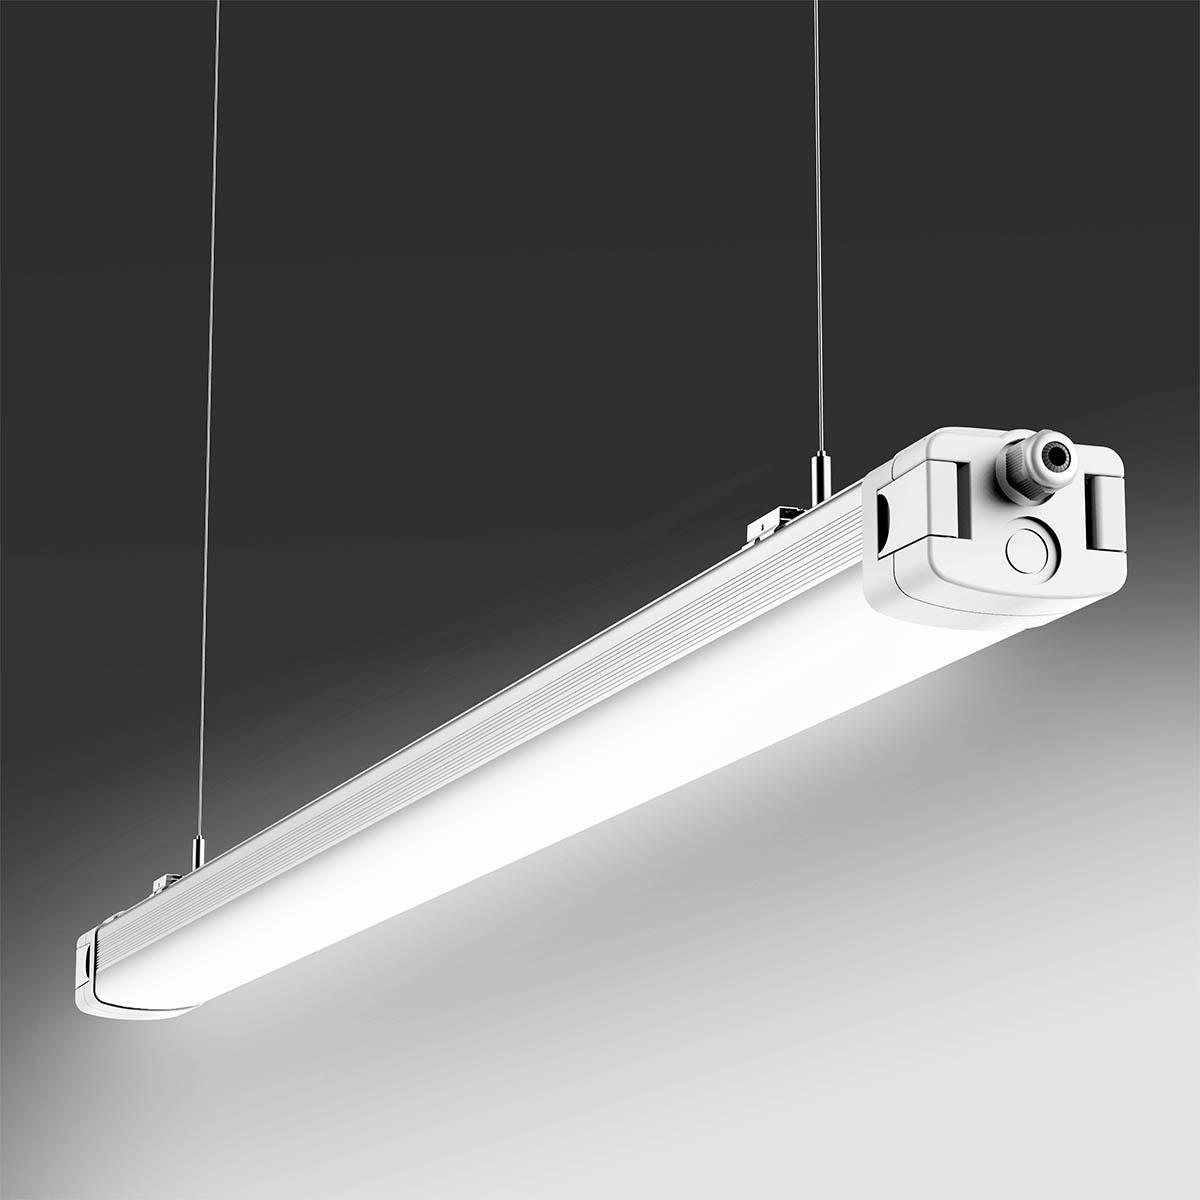 LED Feuchtraumleuchte PRO+ 60W CCT 3000/4000/6000K